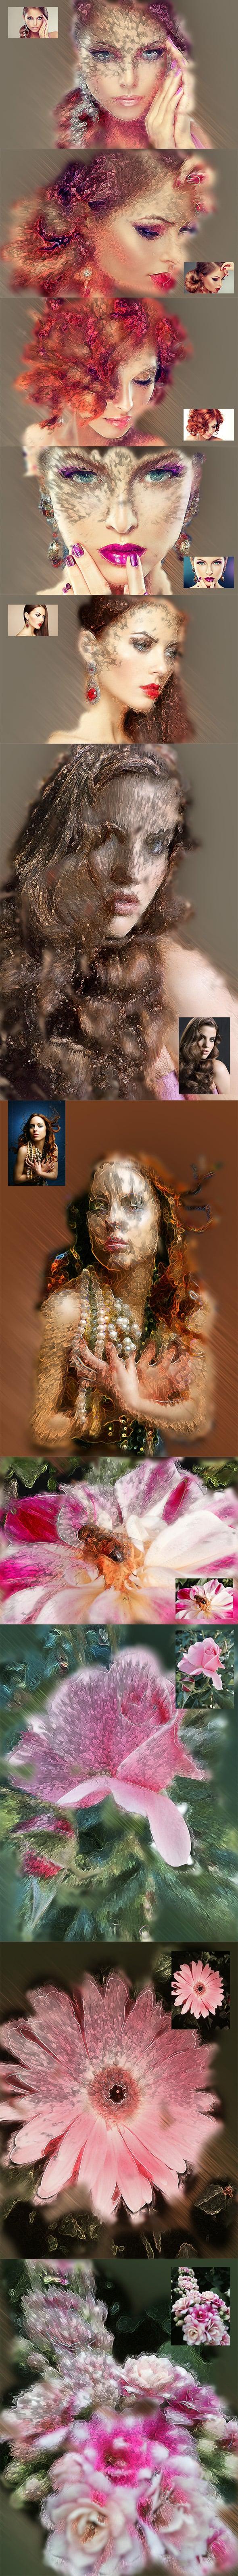 63 VSCO Photoshop Actions: Artistic Actions Bundle - just $9 - 16